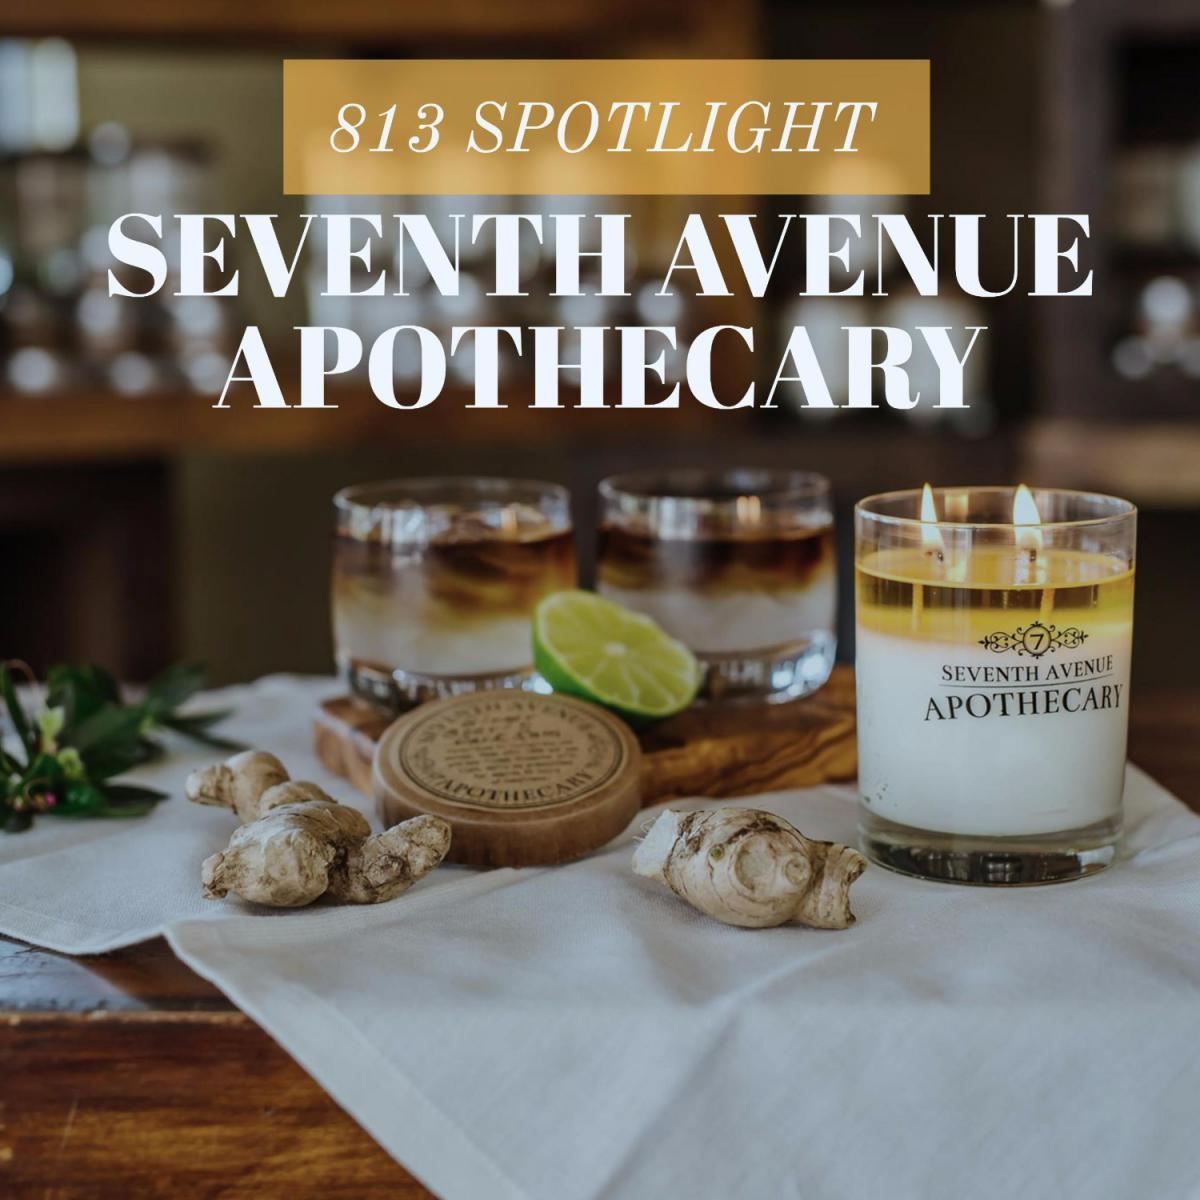 813 Spotlight | Seventh Avenue Apothecary in Ybor City